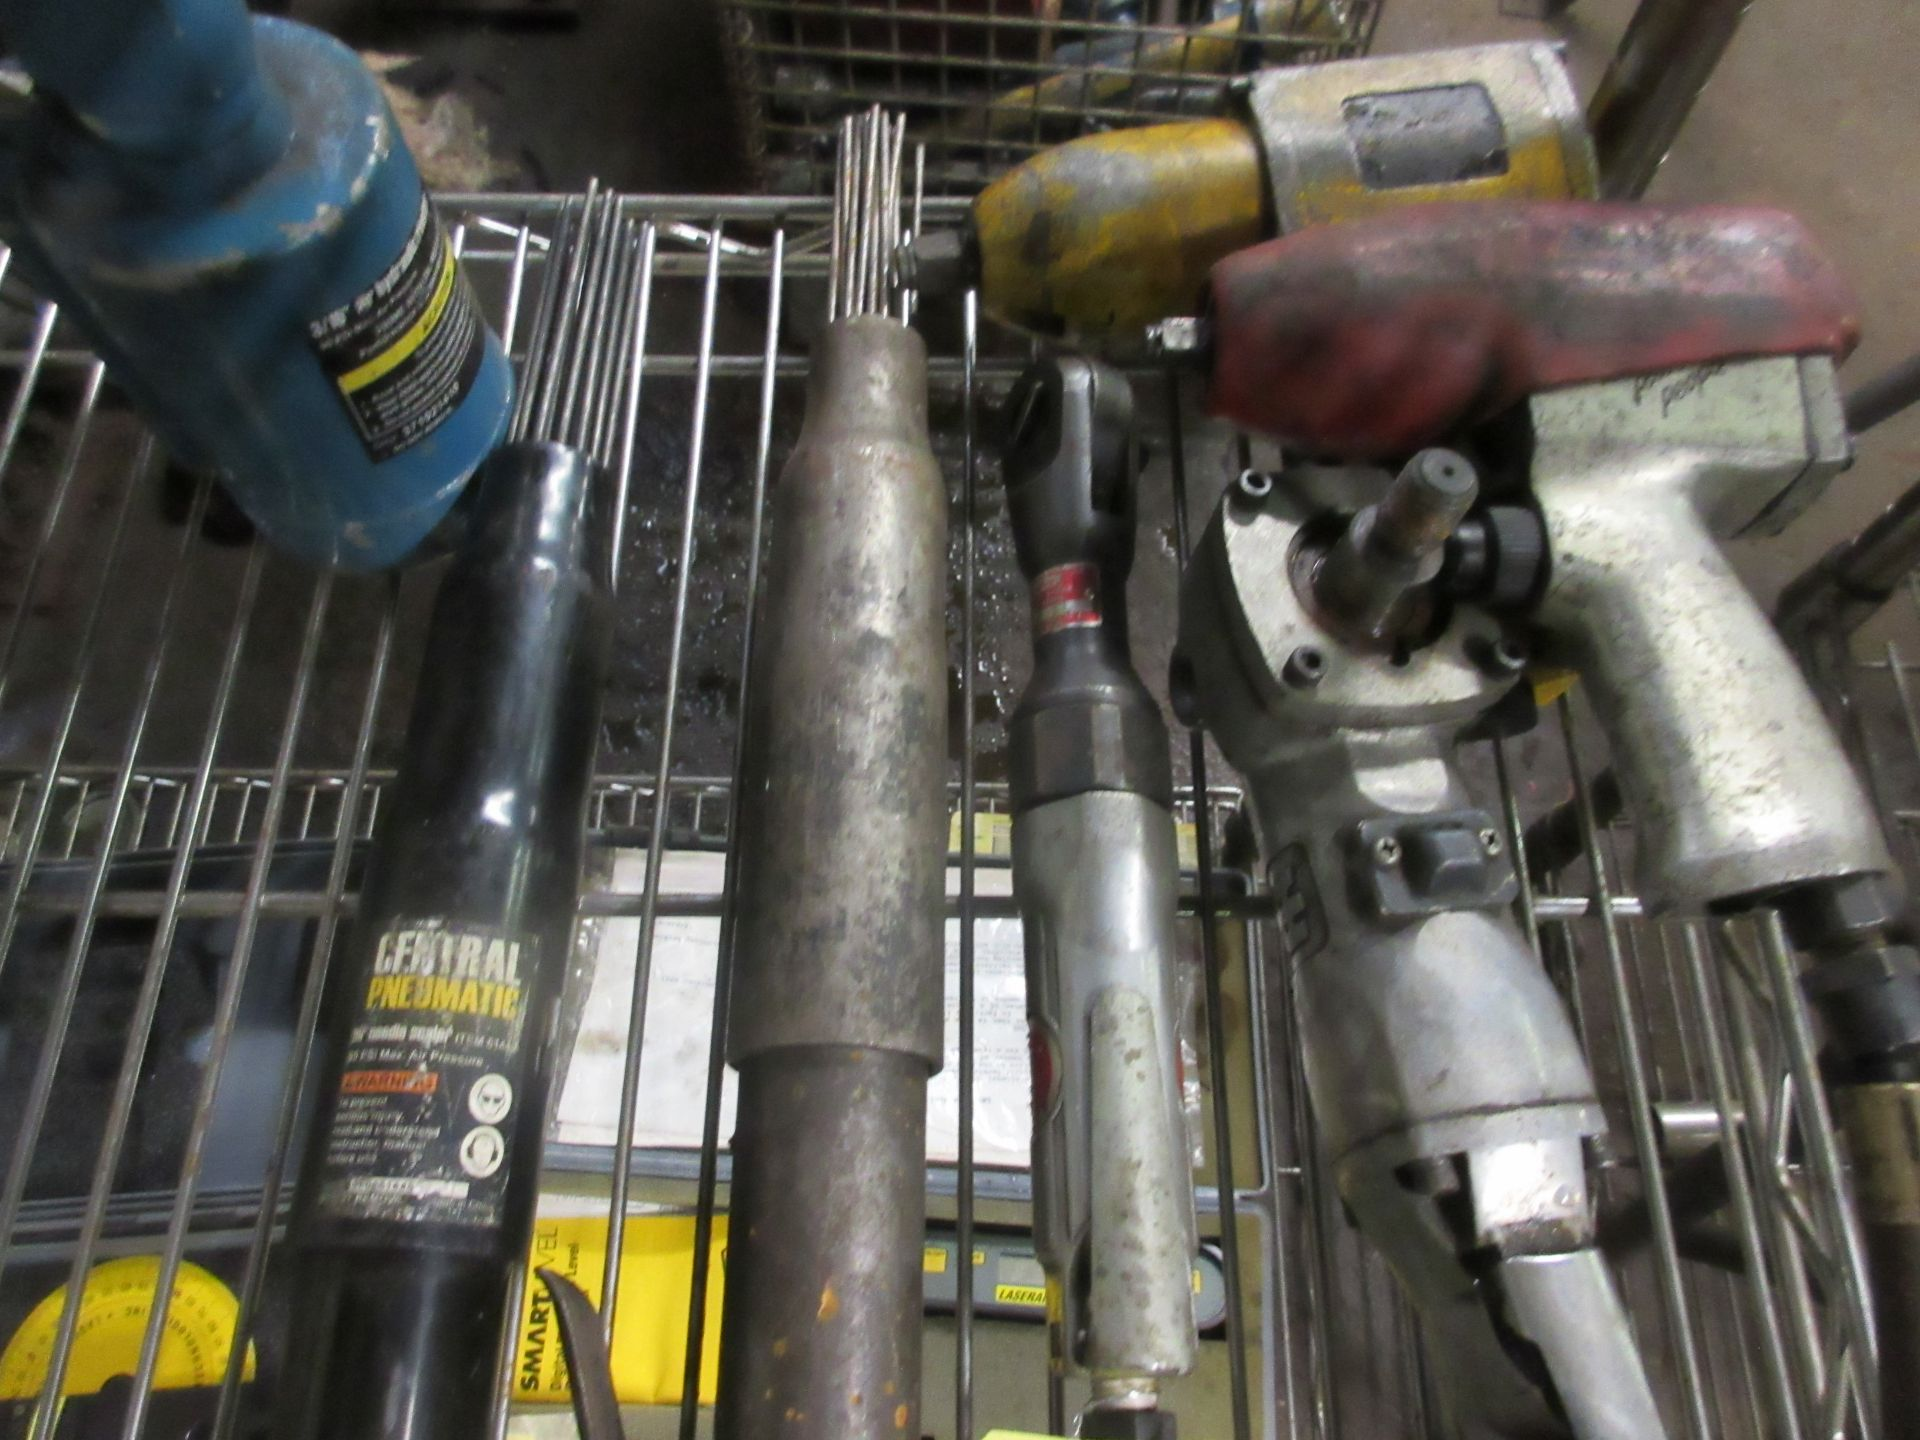 LOT (7) Asst. Pneumatic Tools - Image 2 of 2